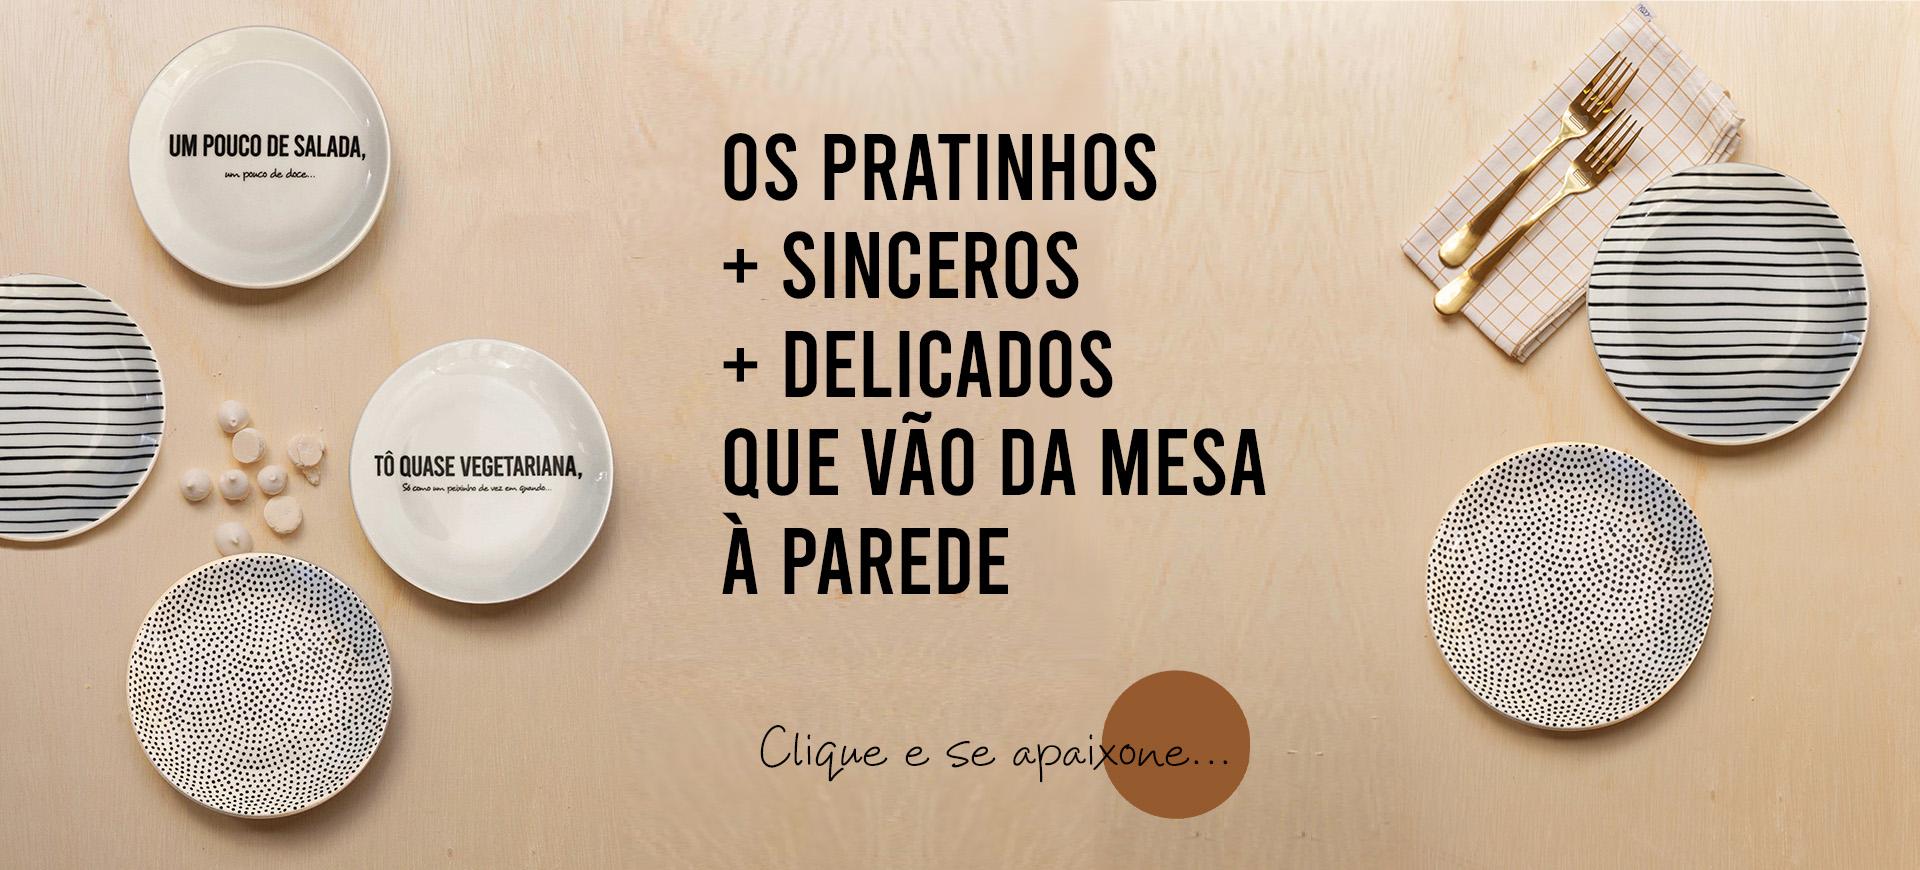 olipop 2